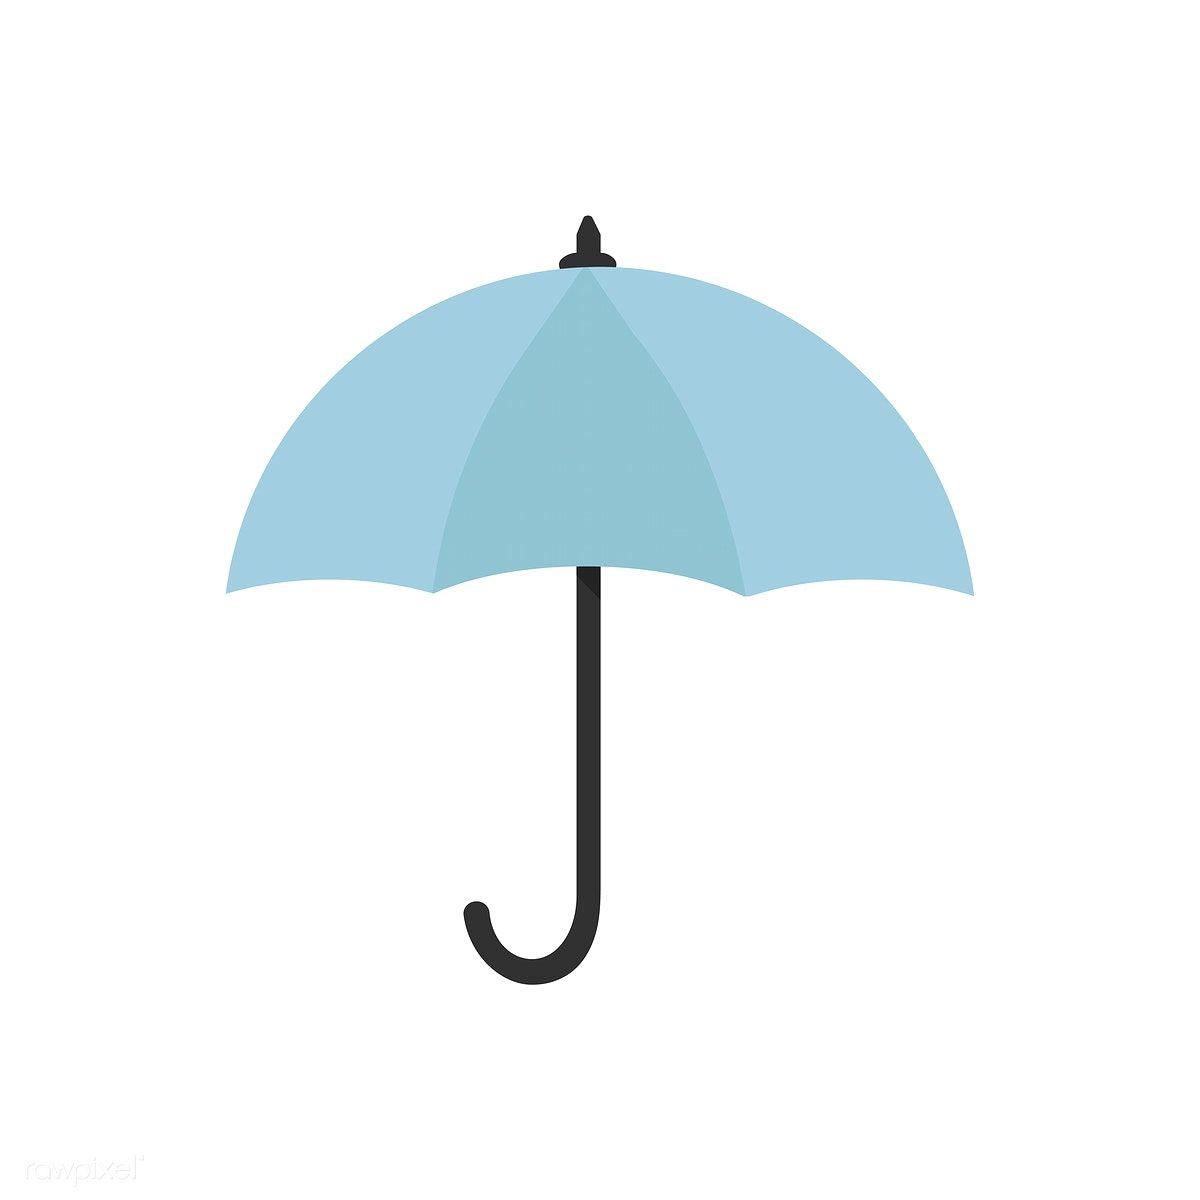 Blue Umbrella Icon Isolated Graphic Illustration Free Image By Rawpixel Com Umbrella Illustration Graphic Illustration Blue Umbrella